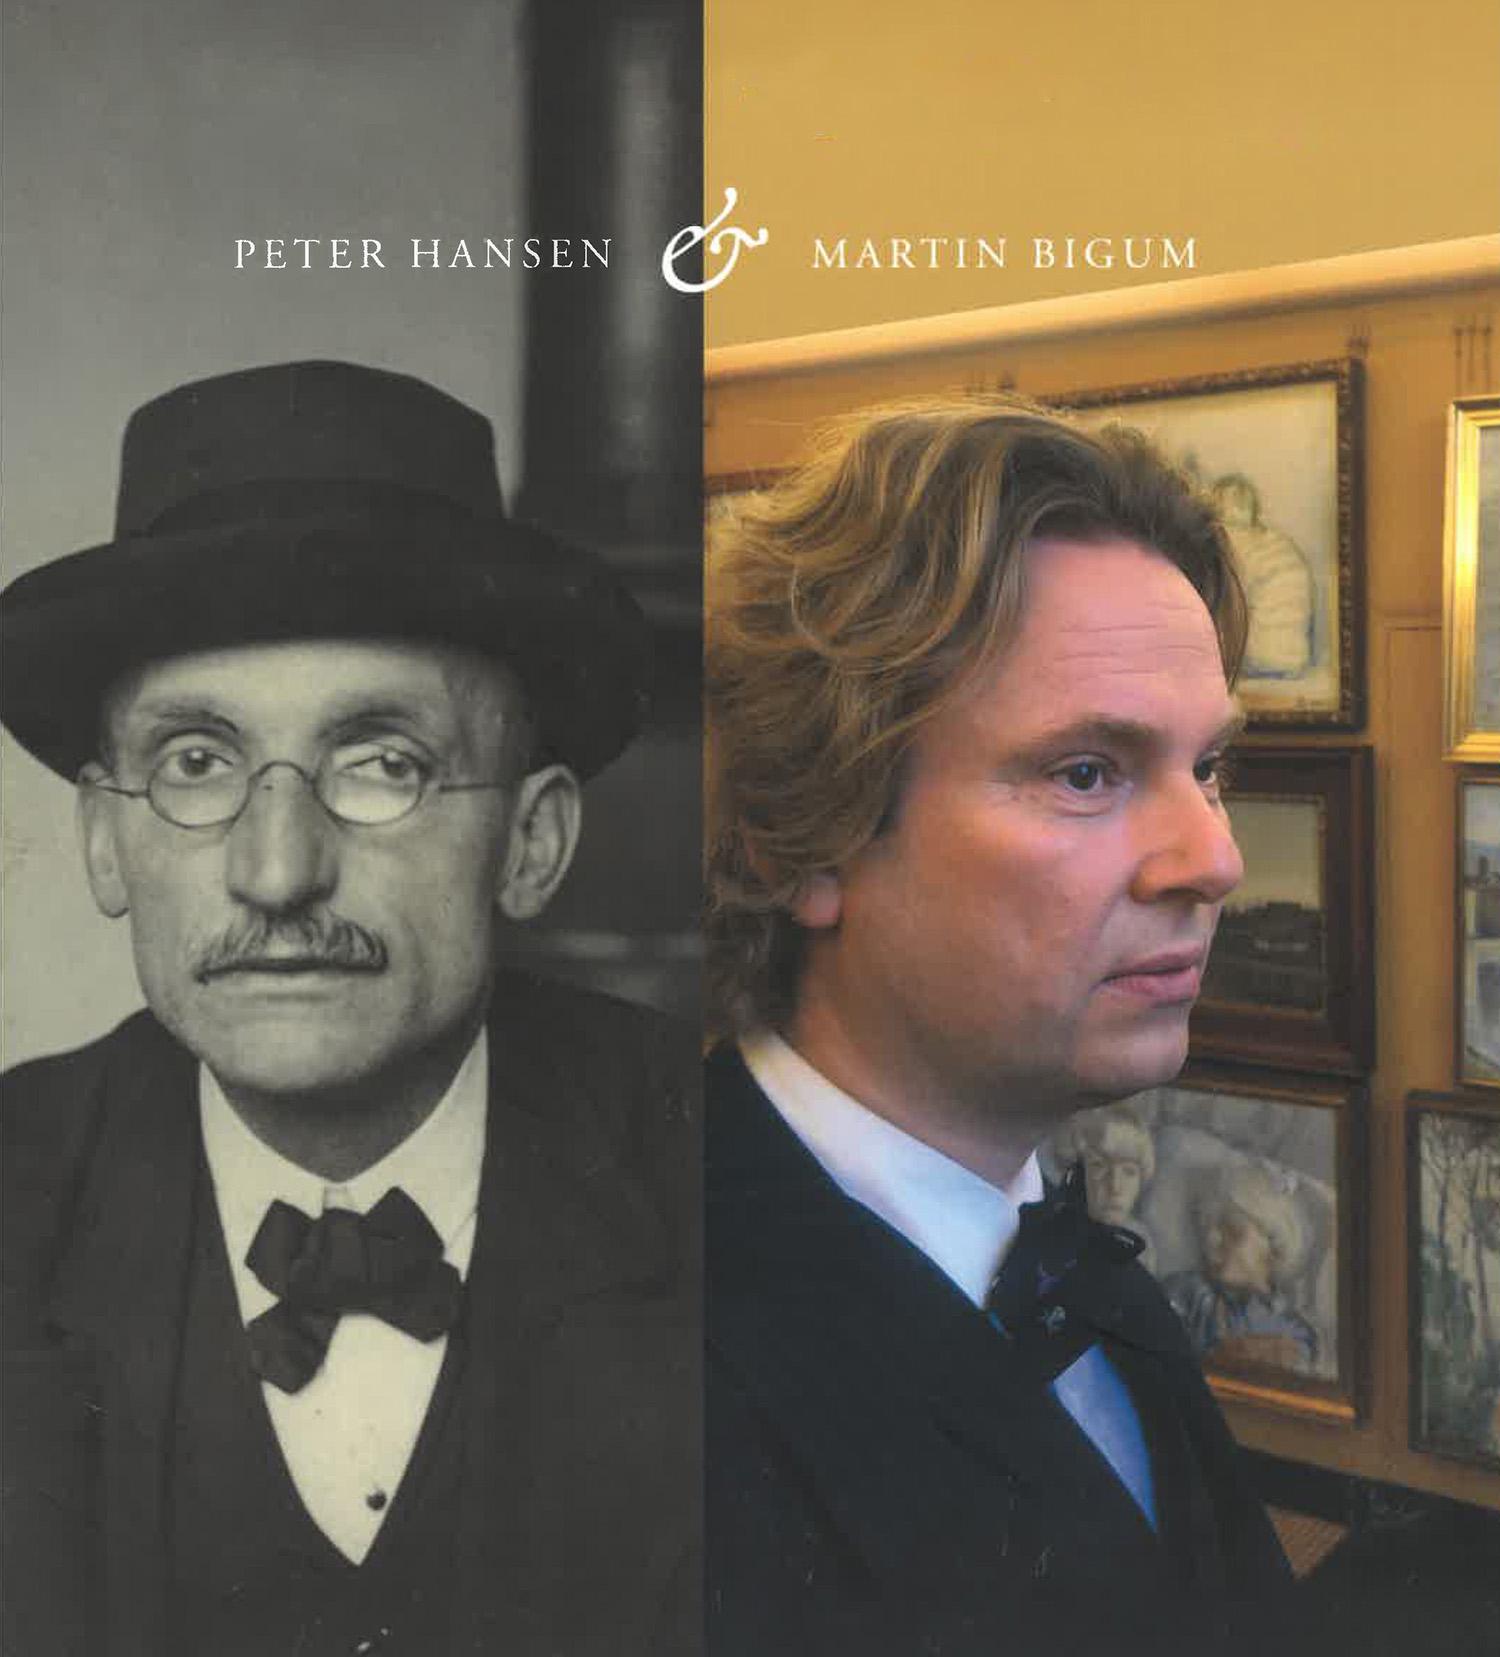 Peter Hansen & Martin Bigum